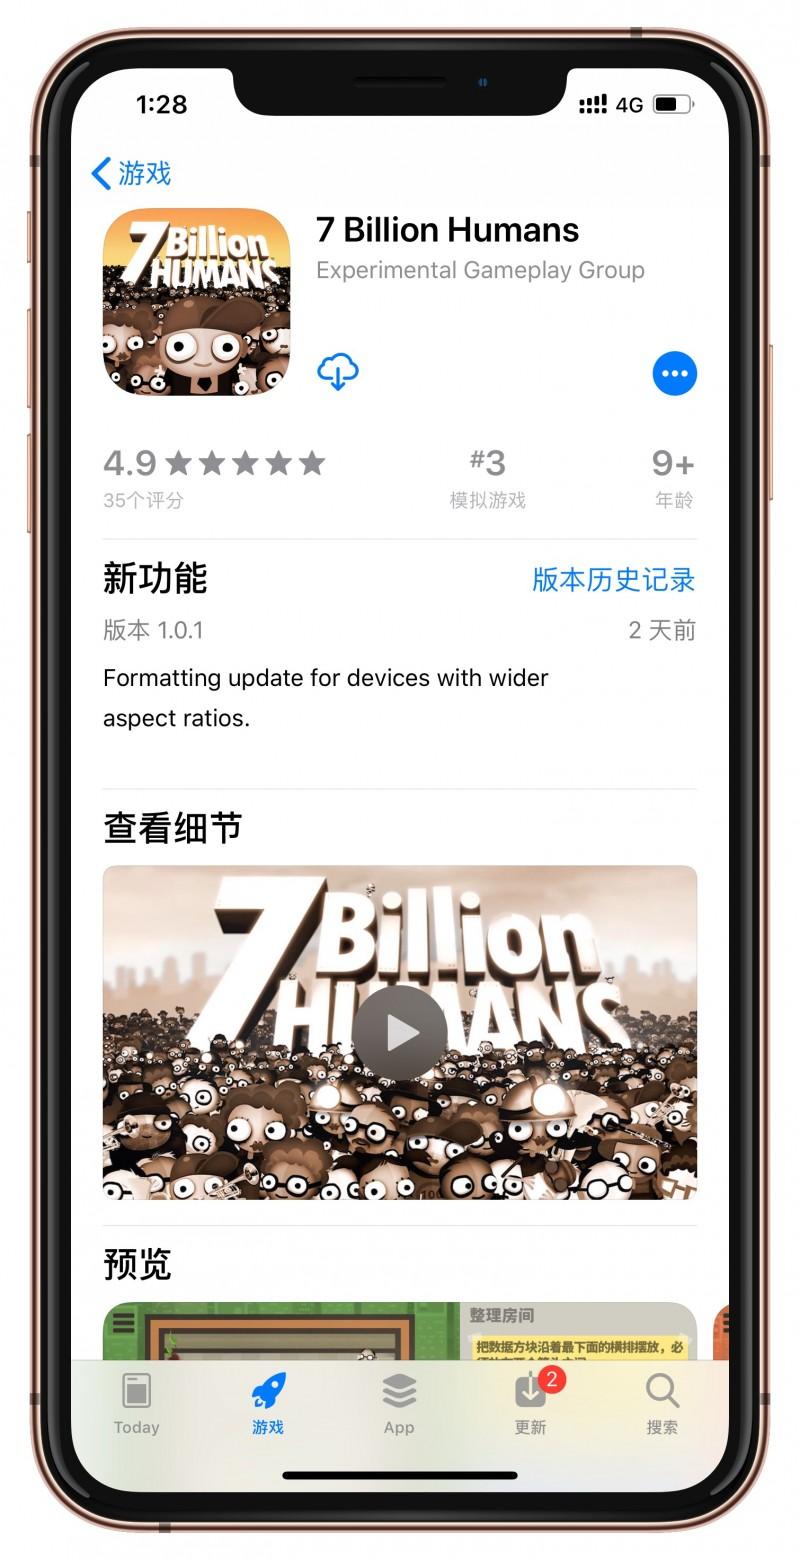 [已购]7 Billion Humans-草蜢资源